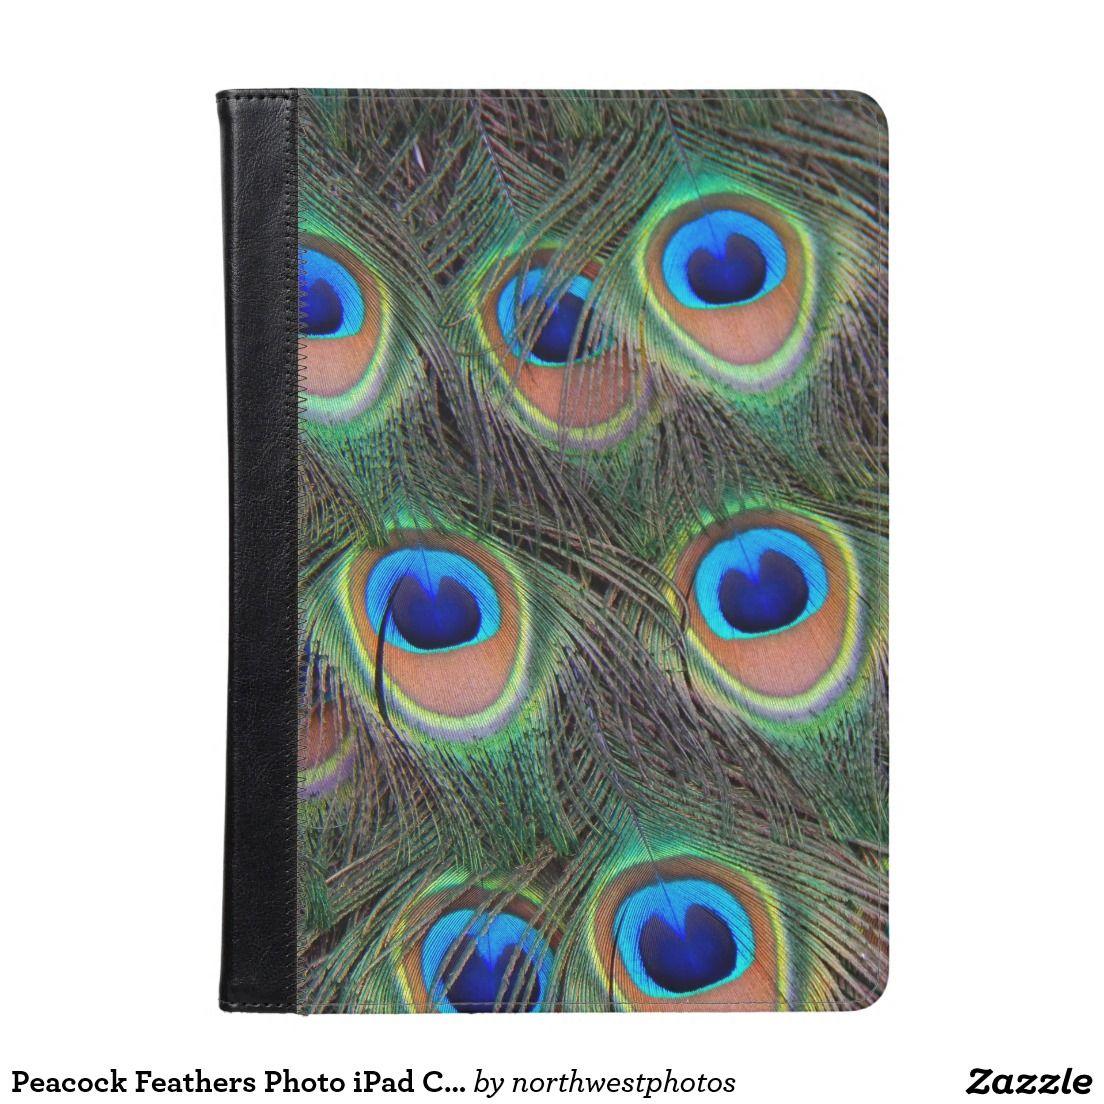 Peacock Feathers Photo iPad Case